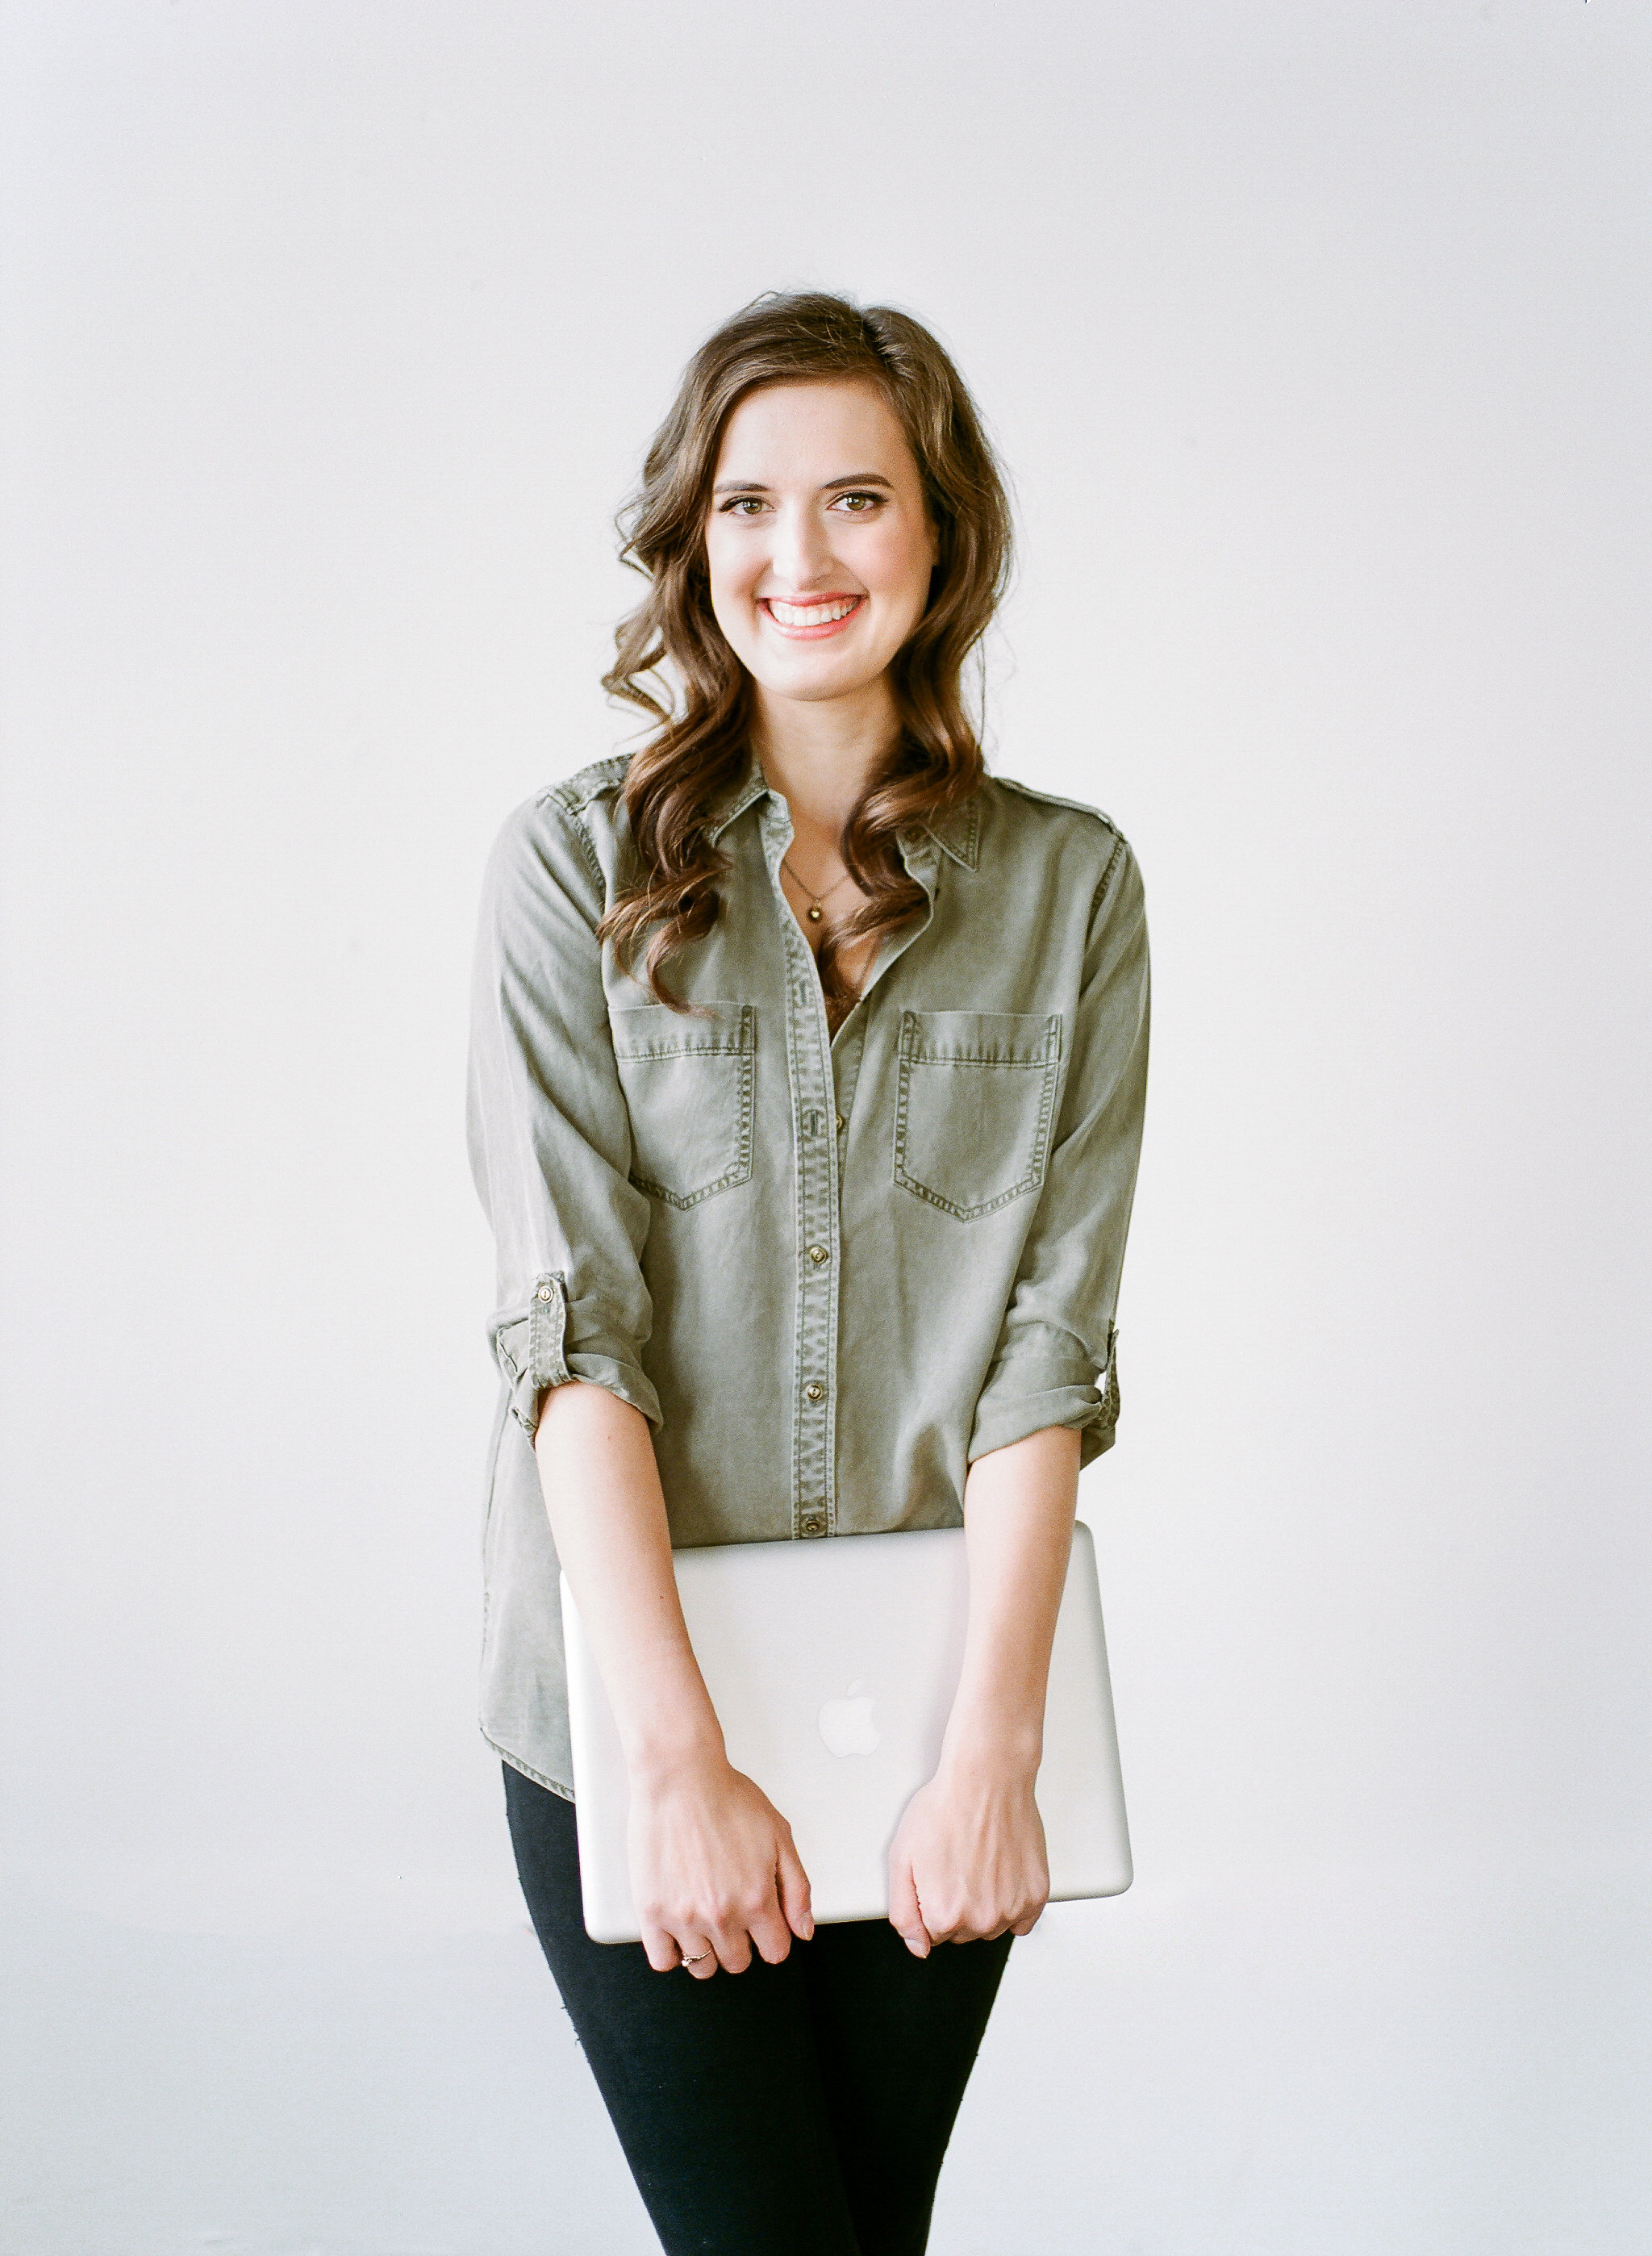 Kayla Hollatz, Copywriter and Content Creator